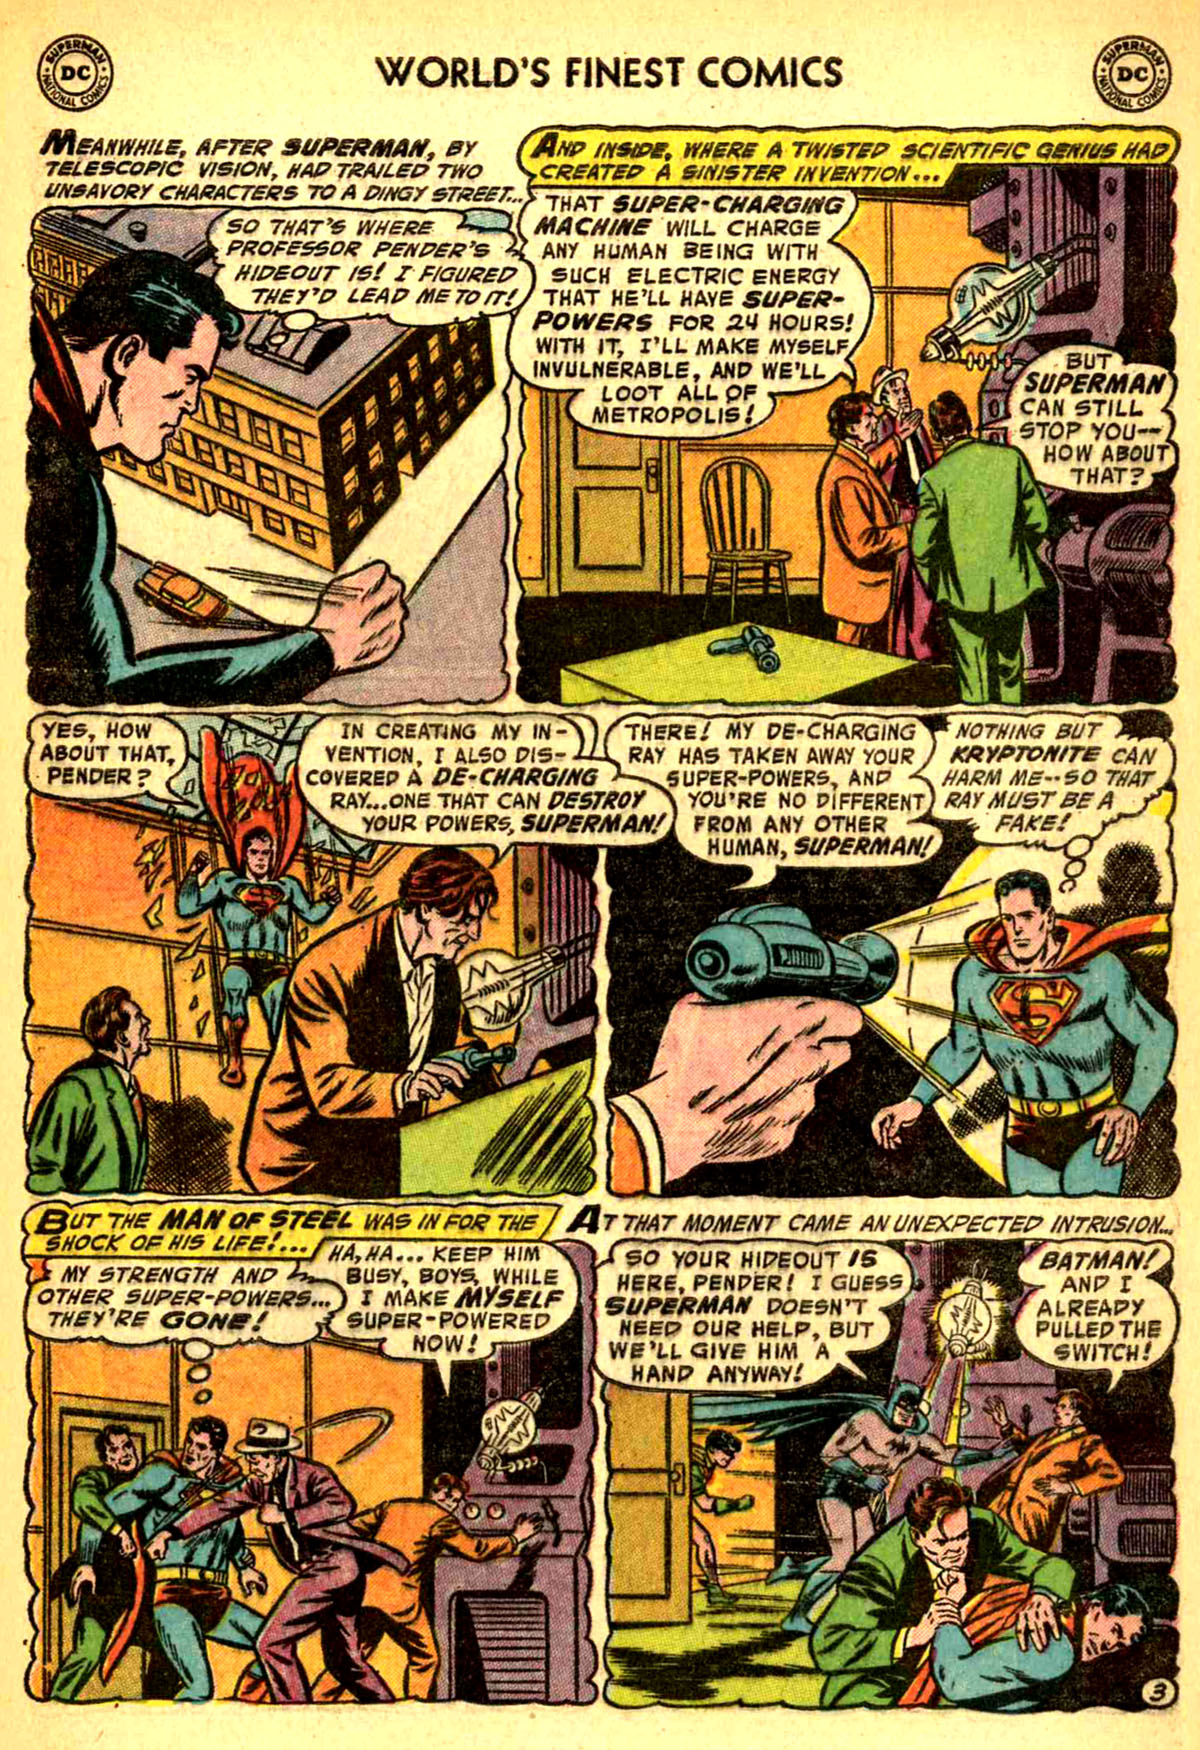 Read online World's Finest Comics comic -  Issue #77 - 5